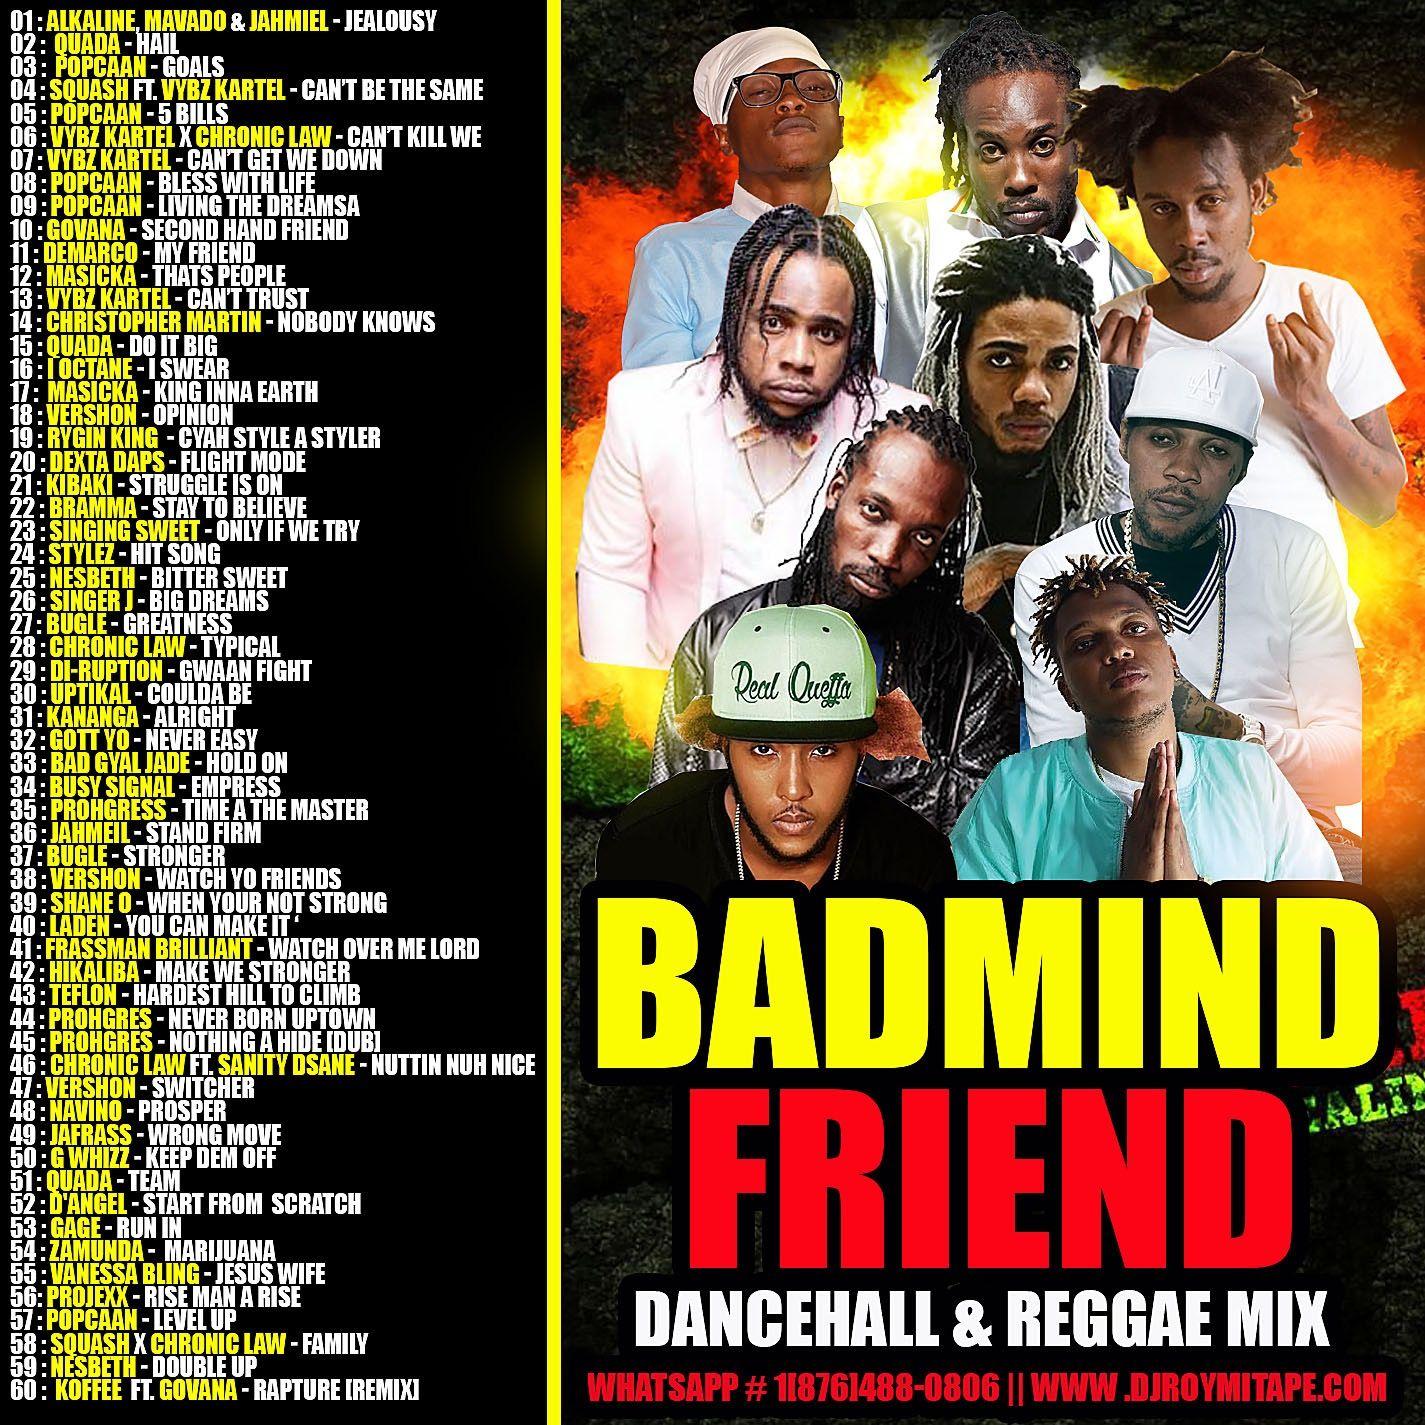 DJ ROY BADMIND FRIENDS DANCEHALL REGGAE MIX by DJROYMIXTAPE from